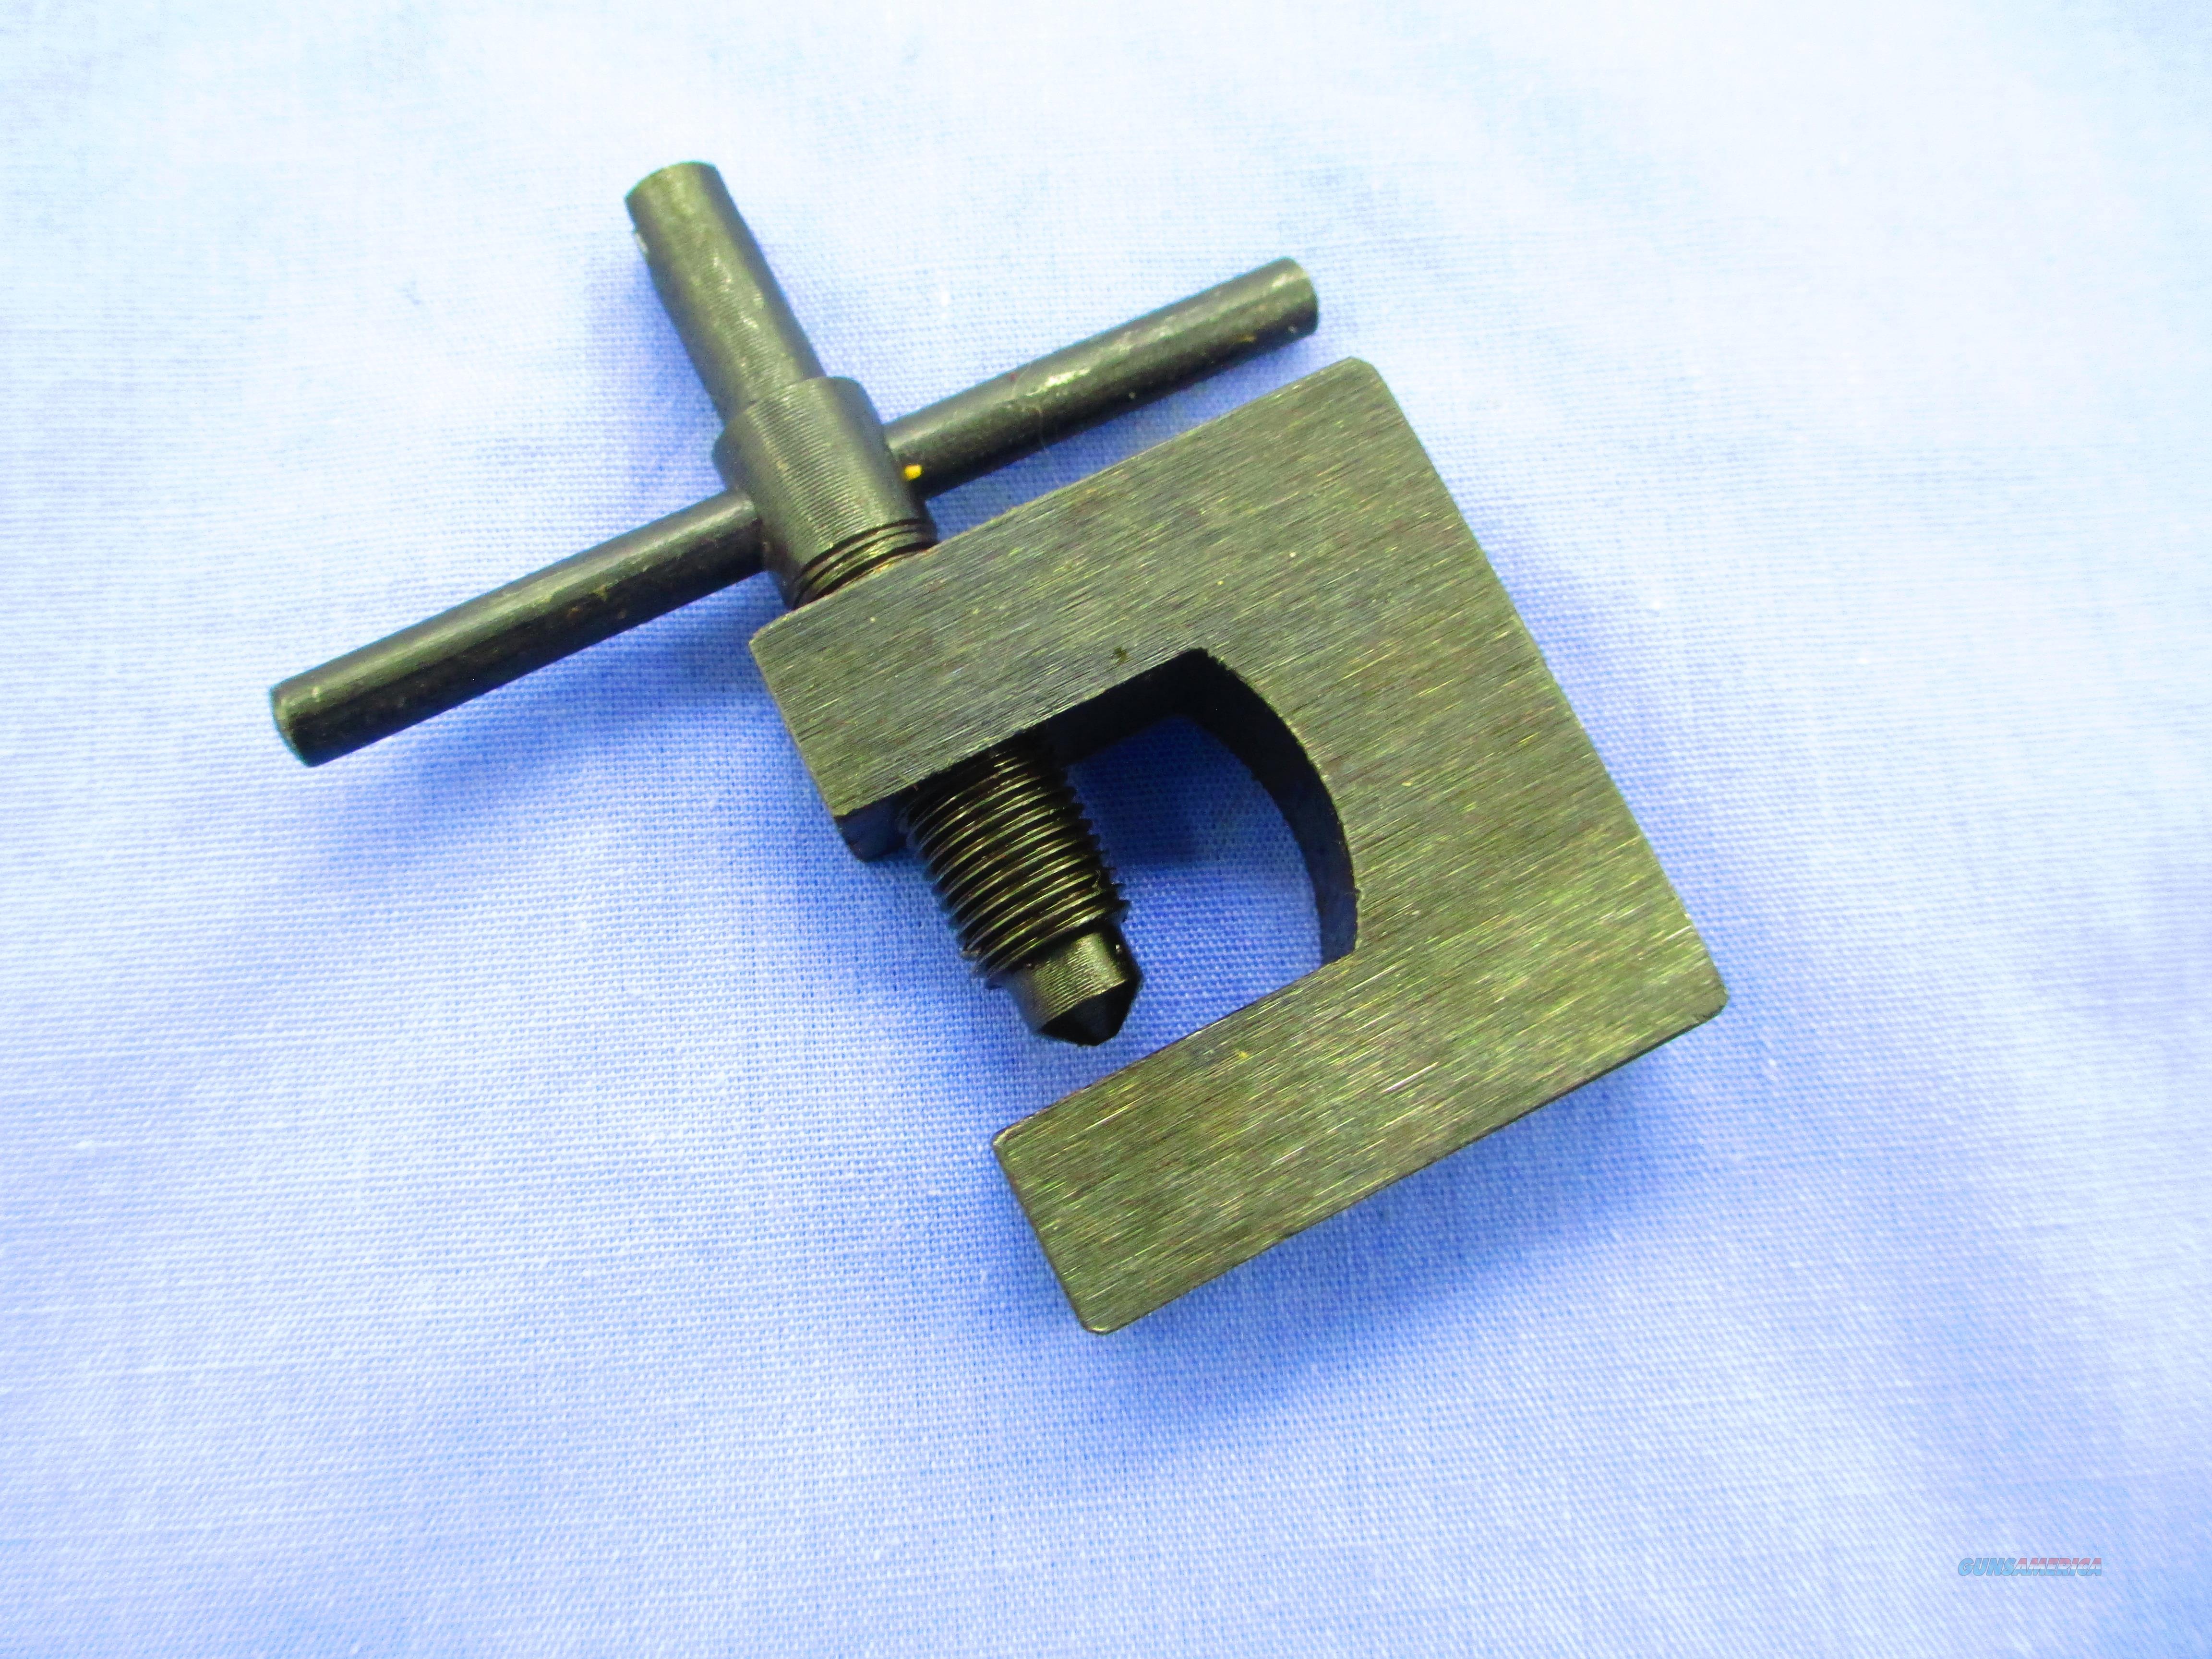 AK SKS FRONT SITE ADJUSTING TOOL  Non-Guns > Gunsmith Tools/Supplies